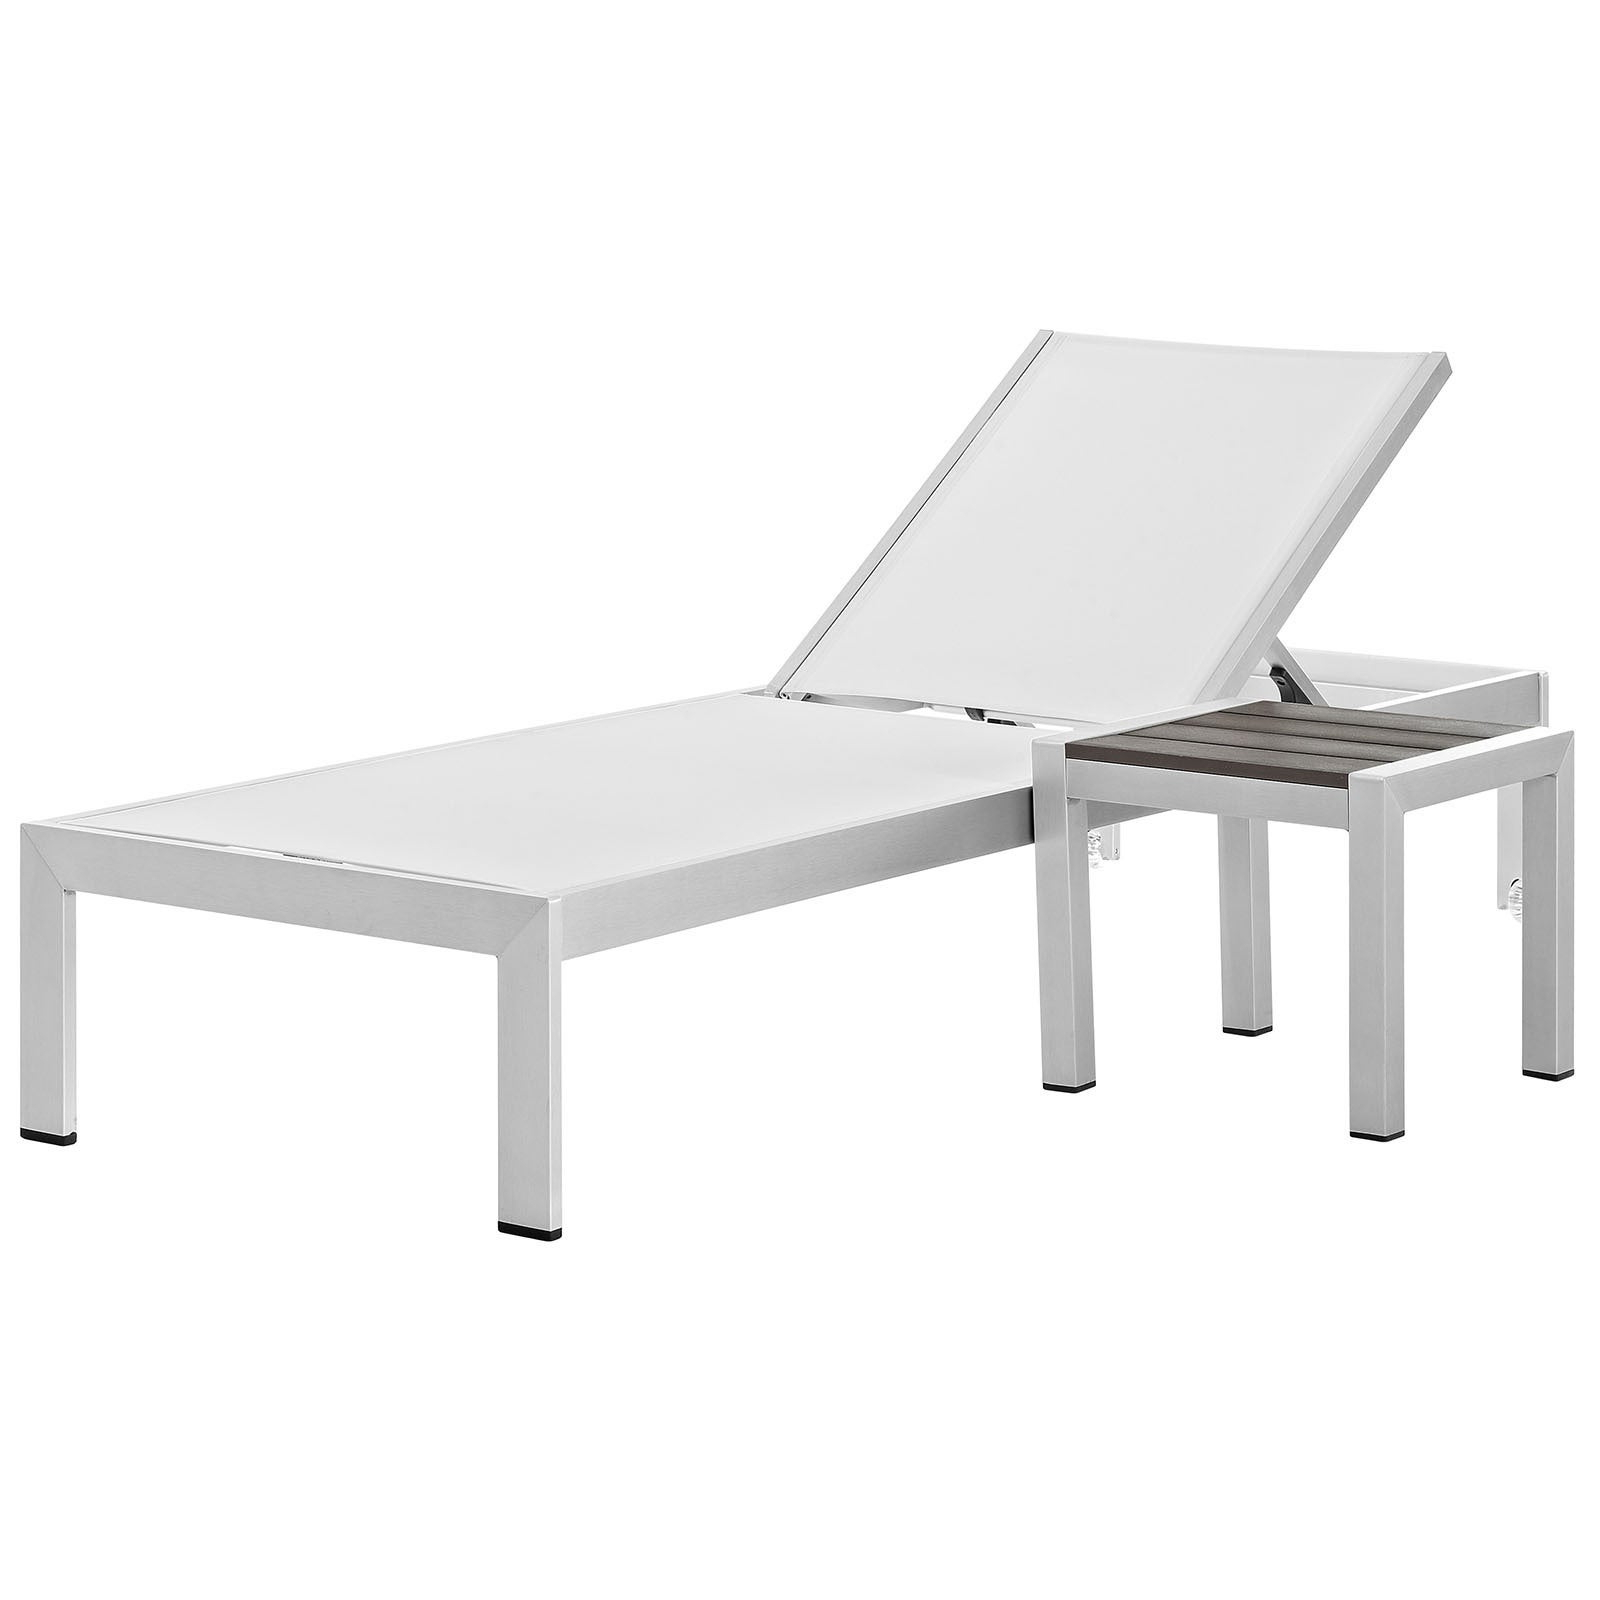 Most Recent Shore Aluminum Outdoor Chaise Set Of 2 Inside Shore Aluminum Outdoor Chaises (View 4 of 25)